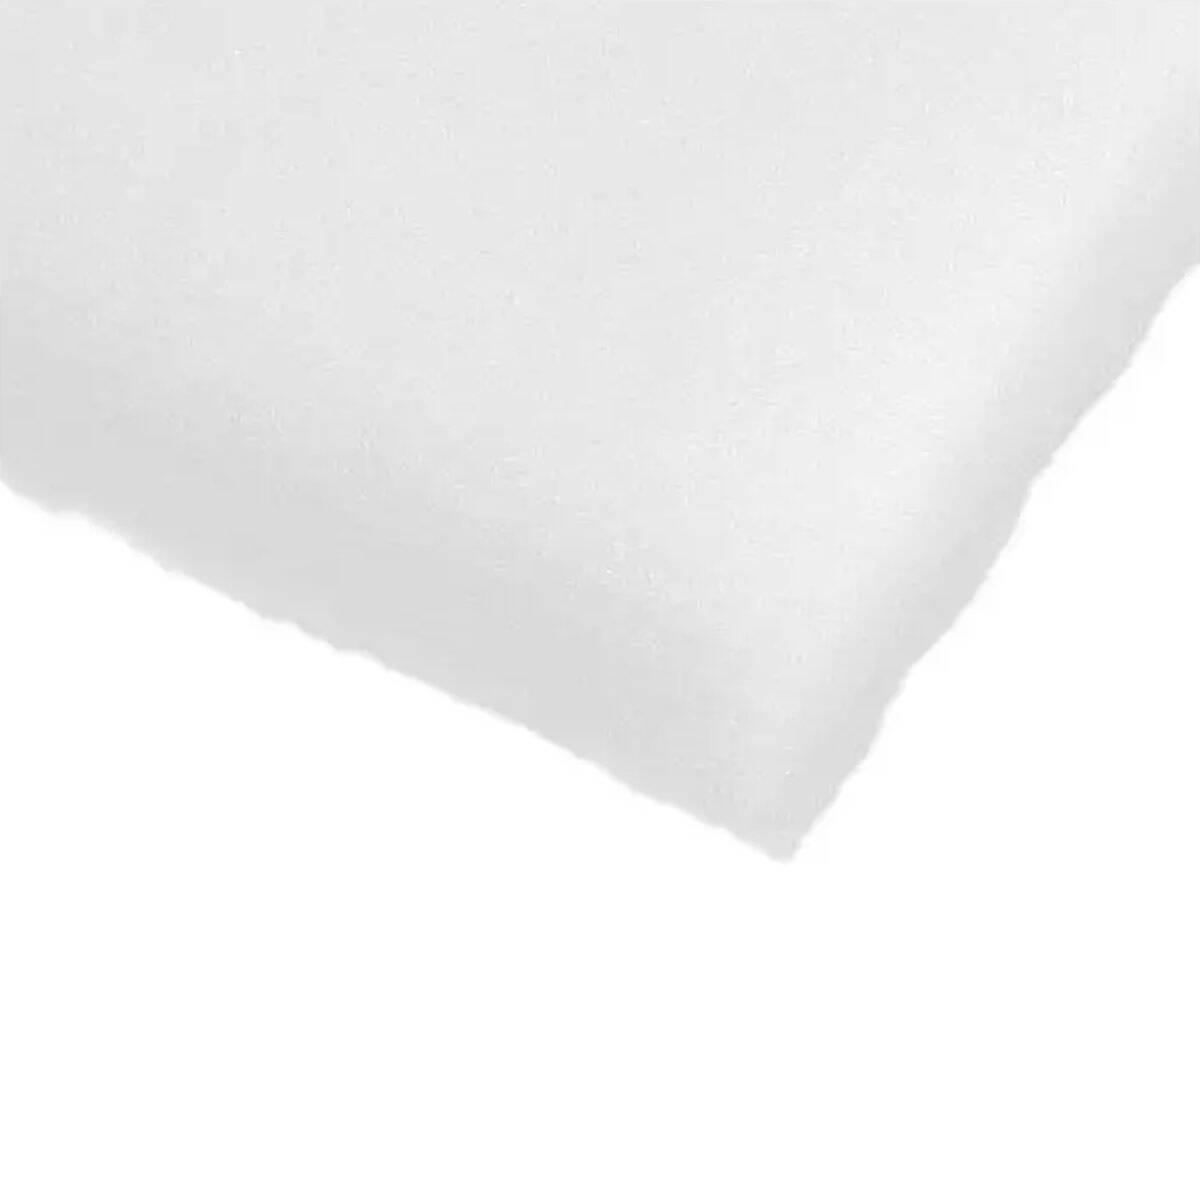 adam hall 58155 d mmwatte f r lautsprecherboxen wei. Black Bedroom Furniture Sets. Home Design Ideas